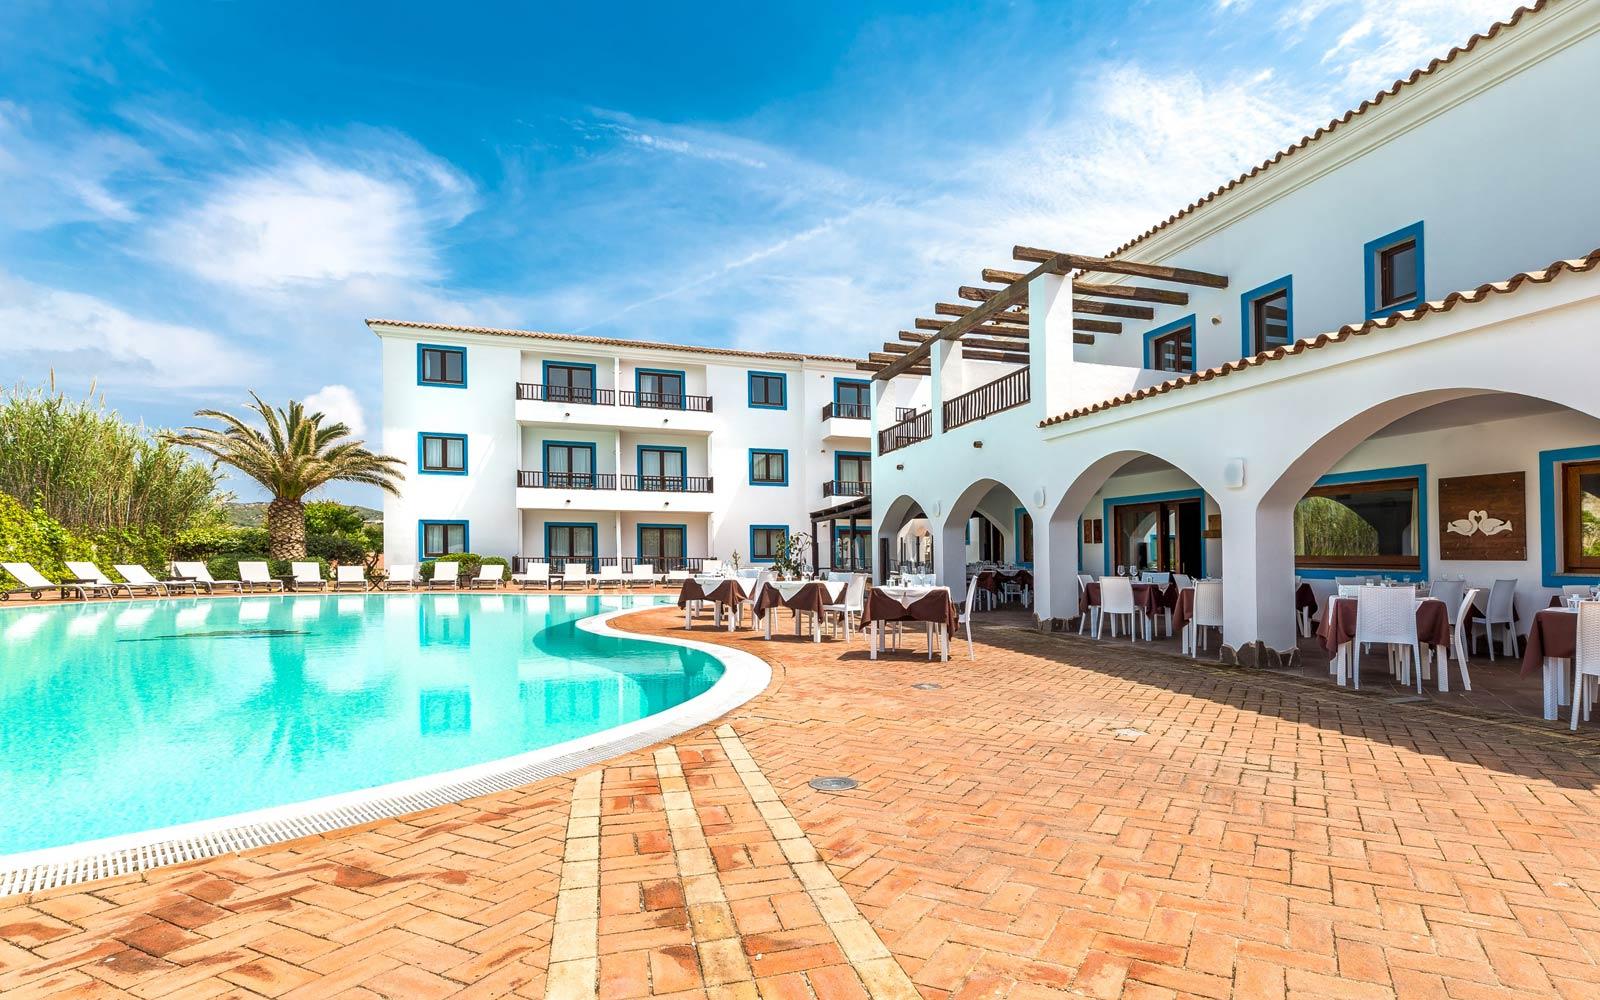 Swimming Pool at Hotel La Funtana